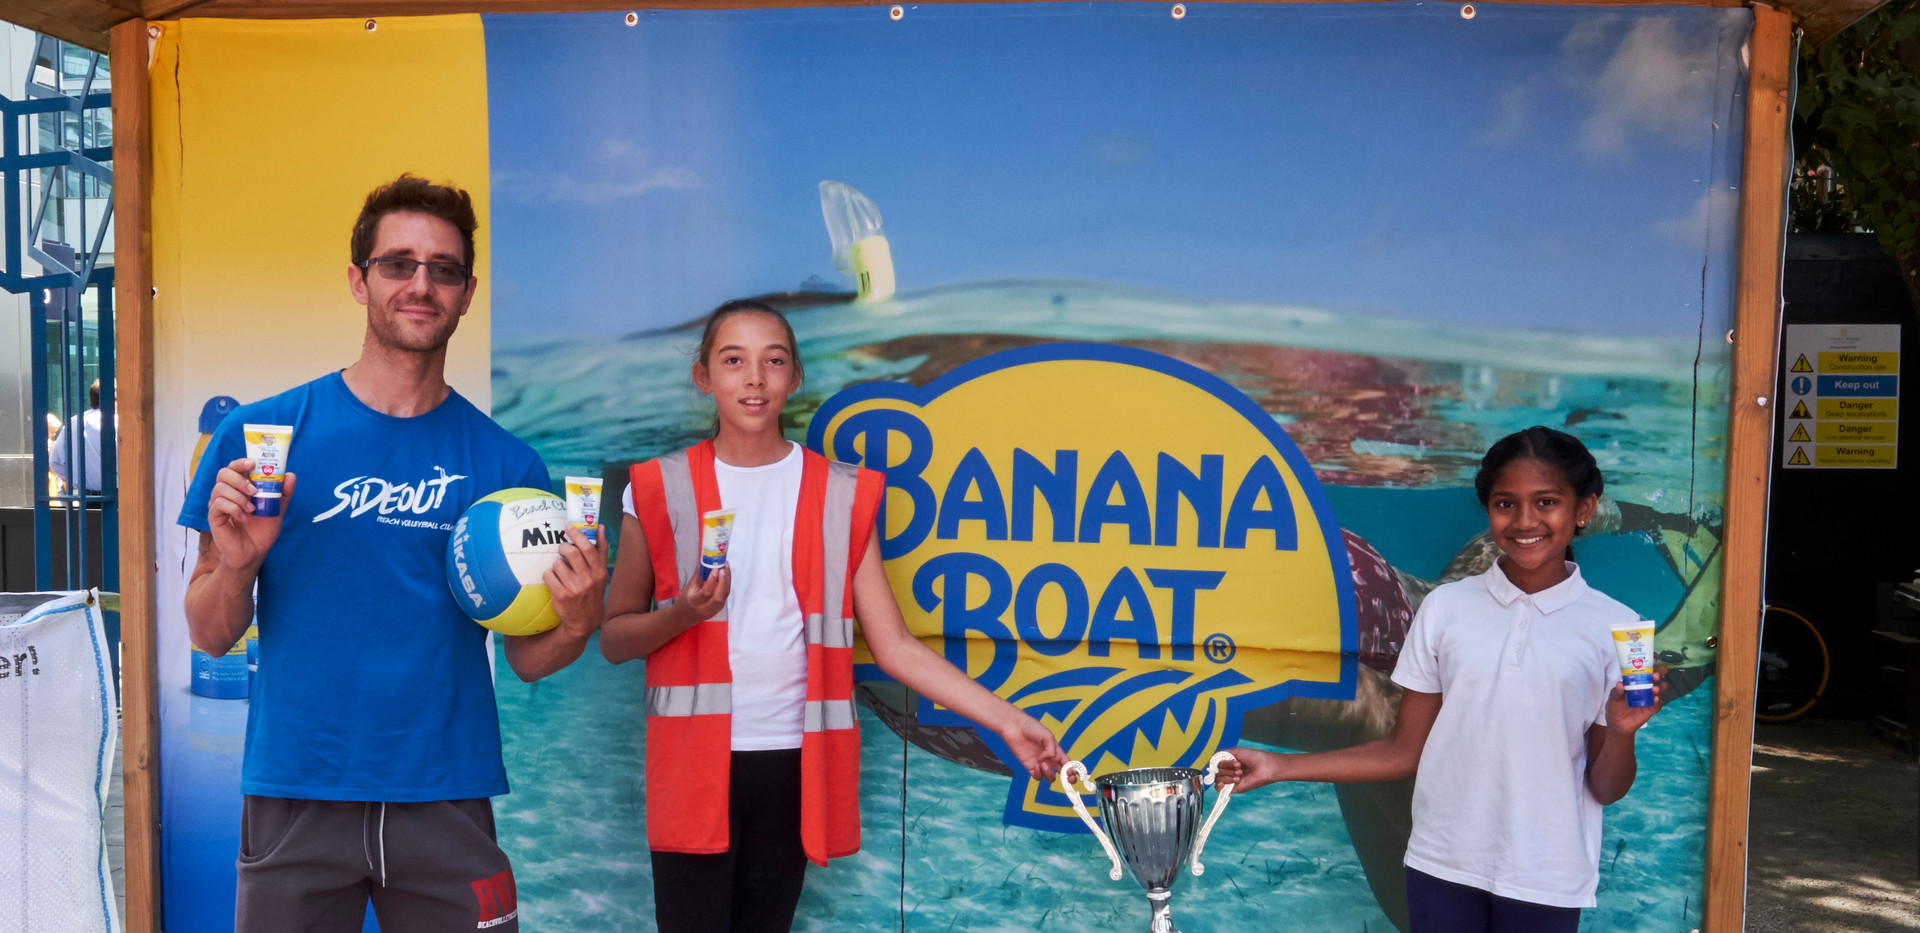 Banana Boat product promo.jpg